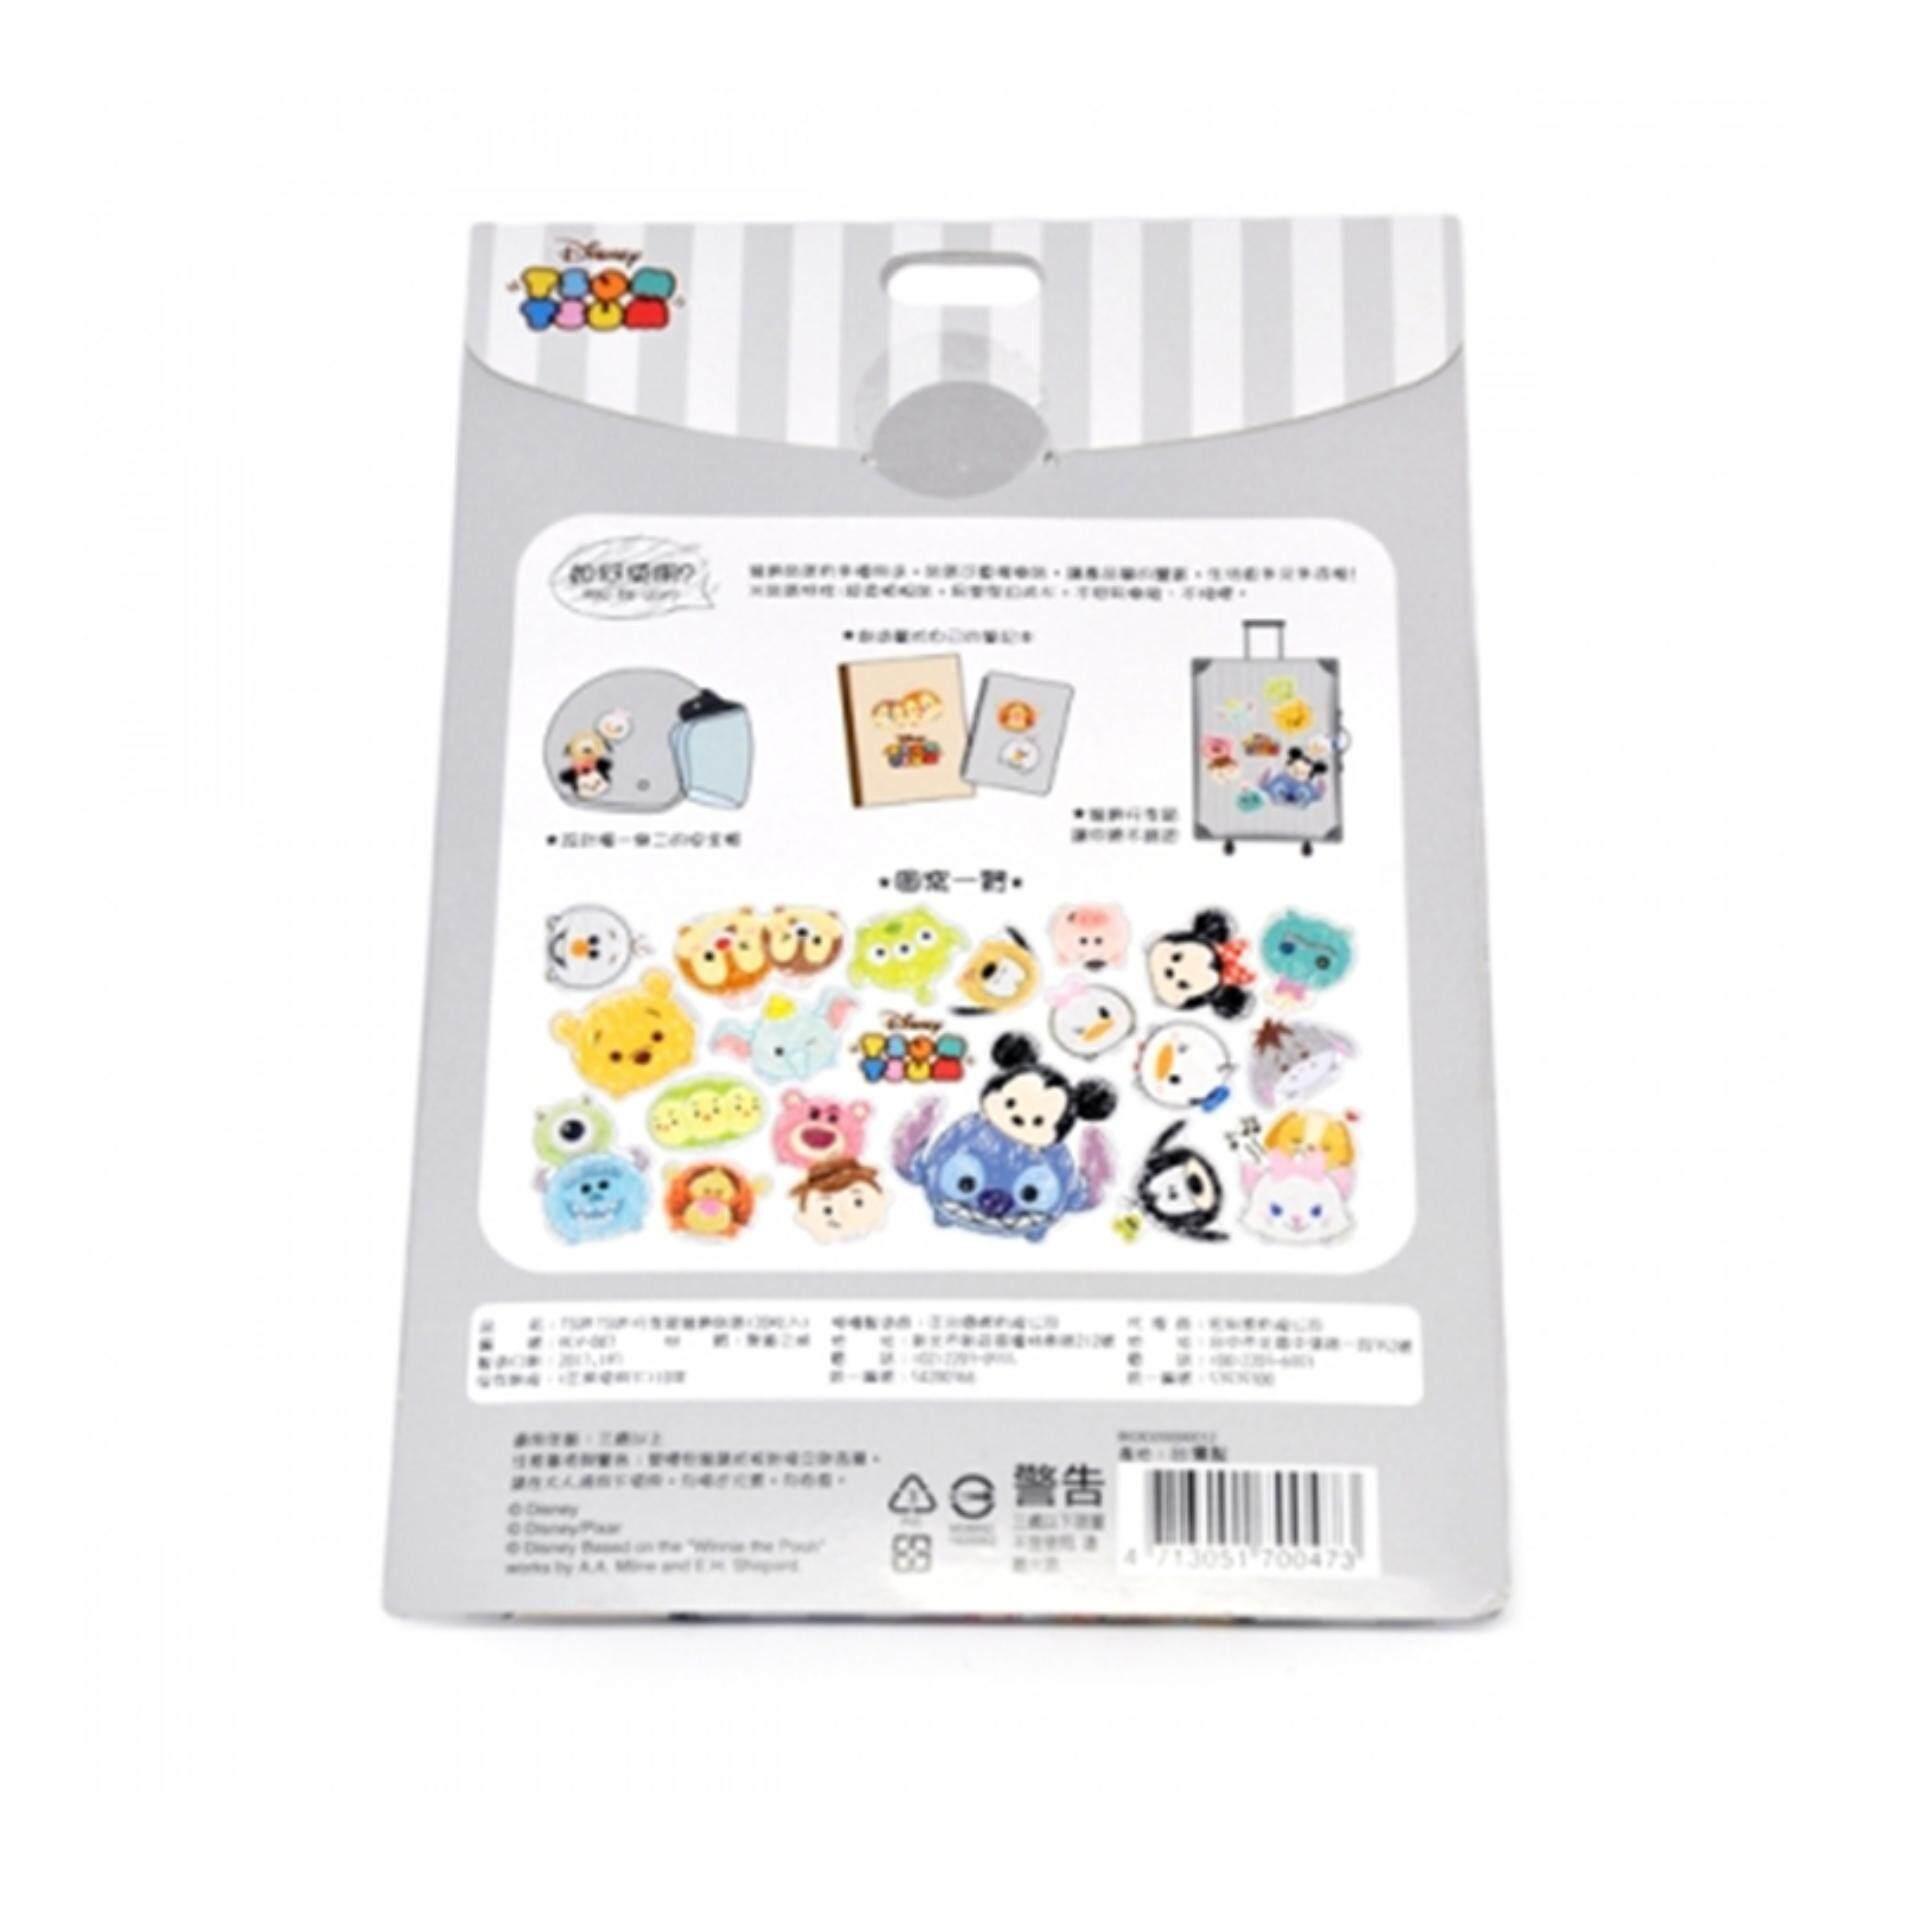 Disney Tsum Tsum Deco Sticker - Mix